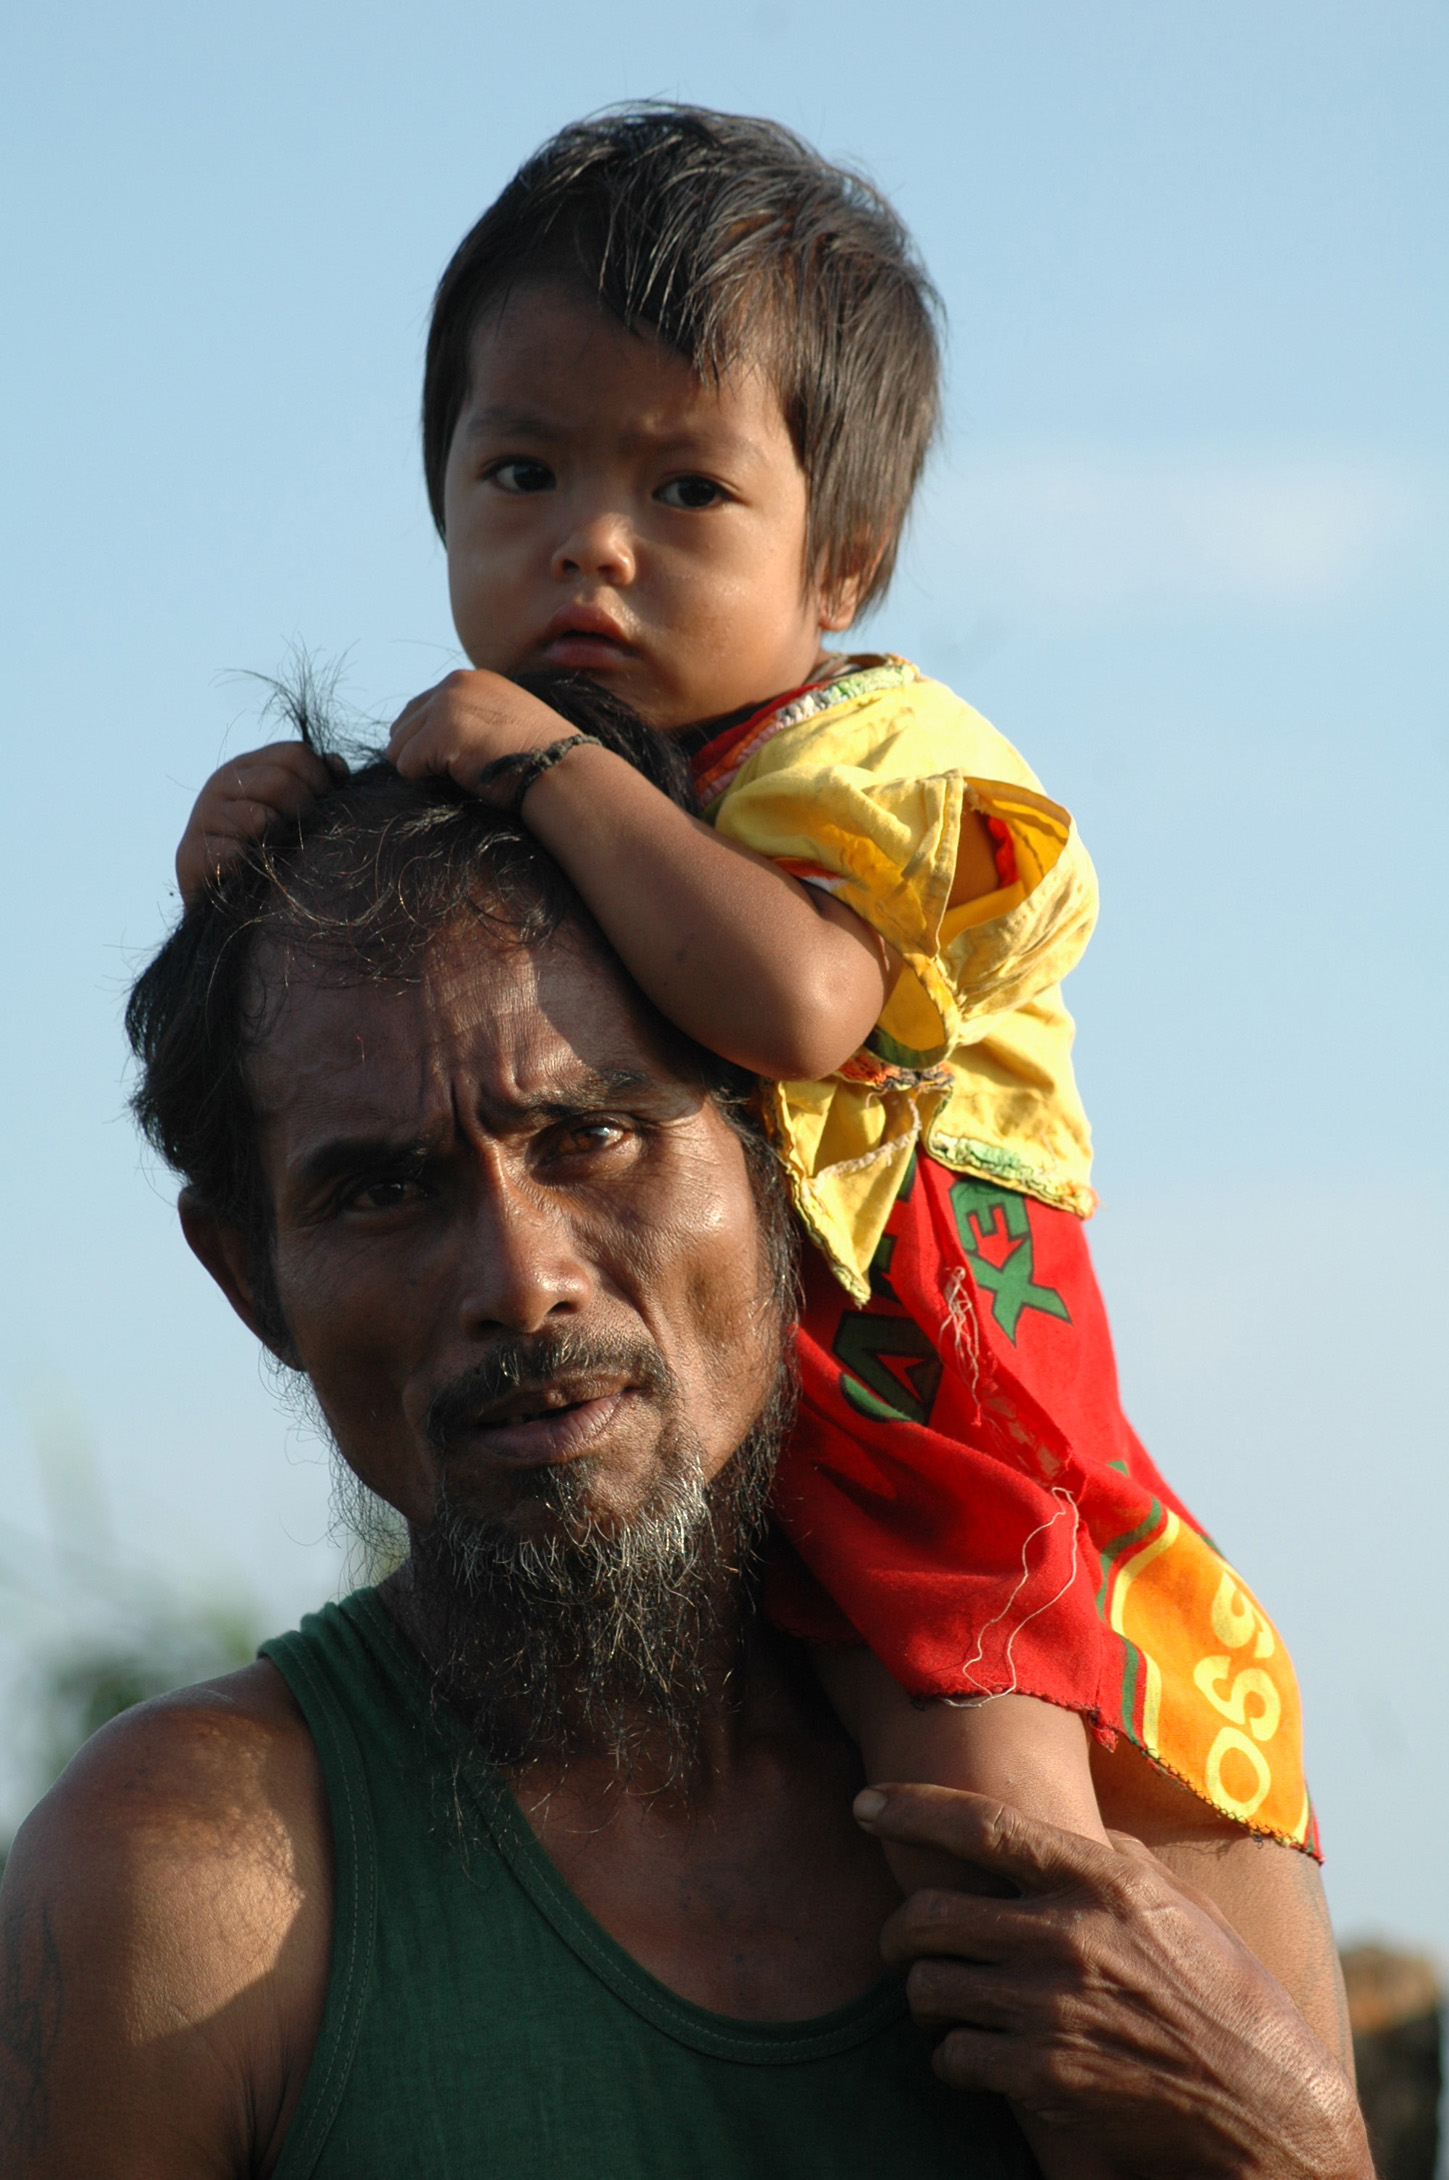 Father, Beard, Bspo06, Carry, Child, HQ Photo